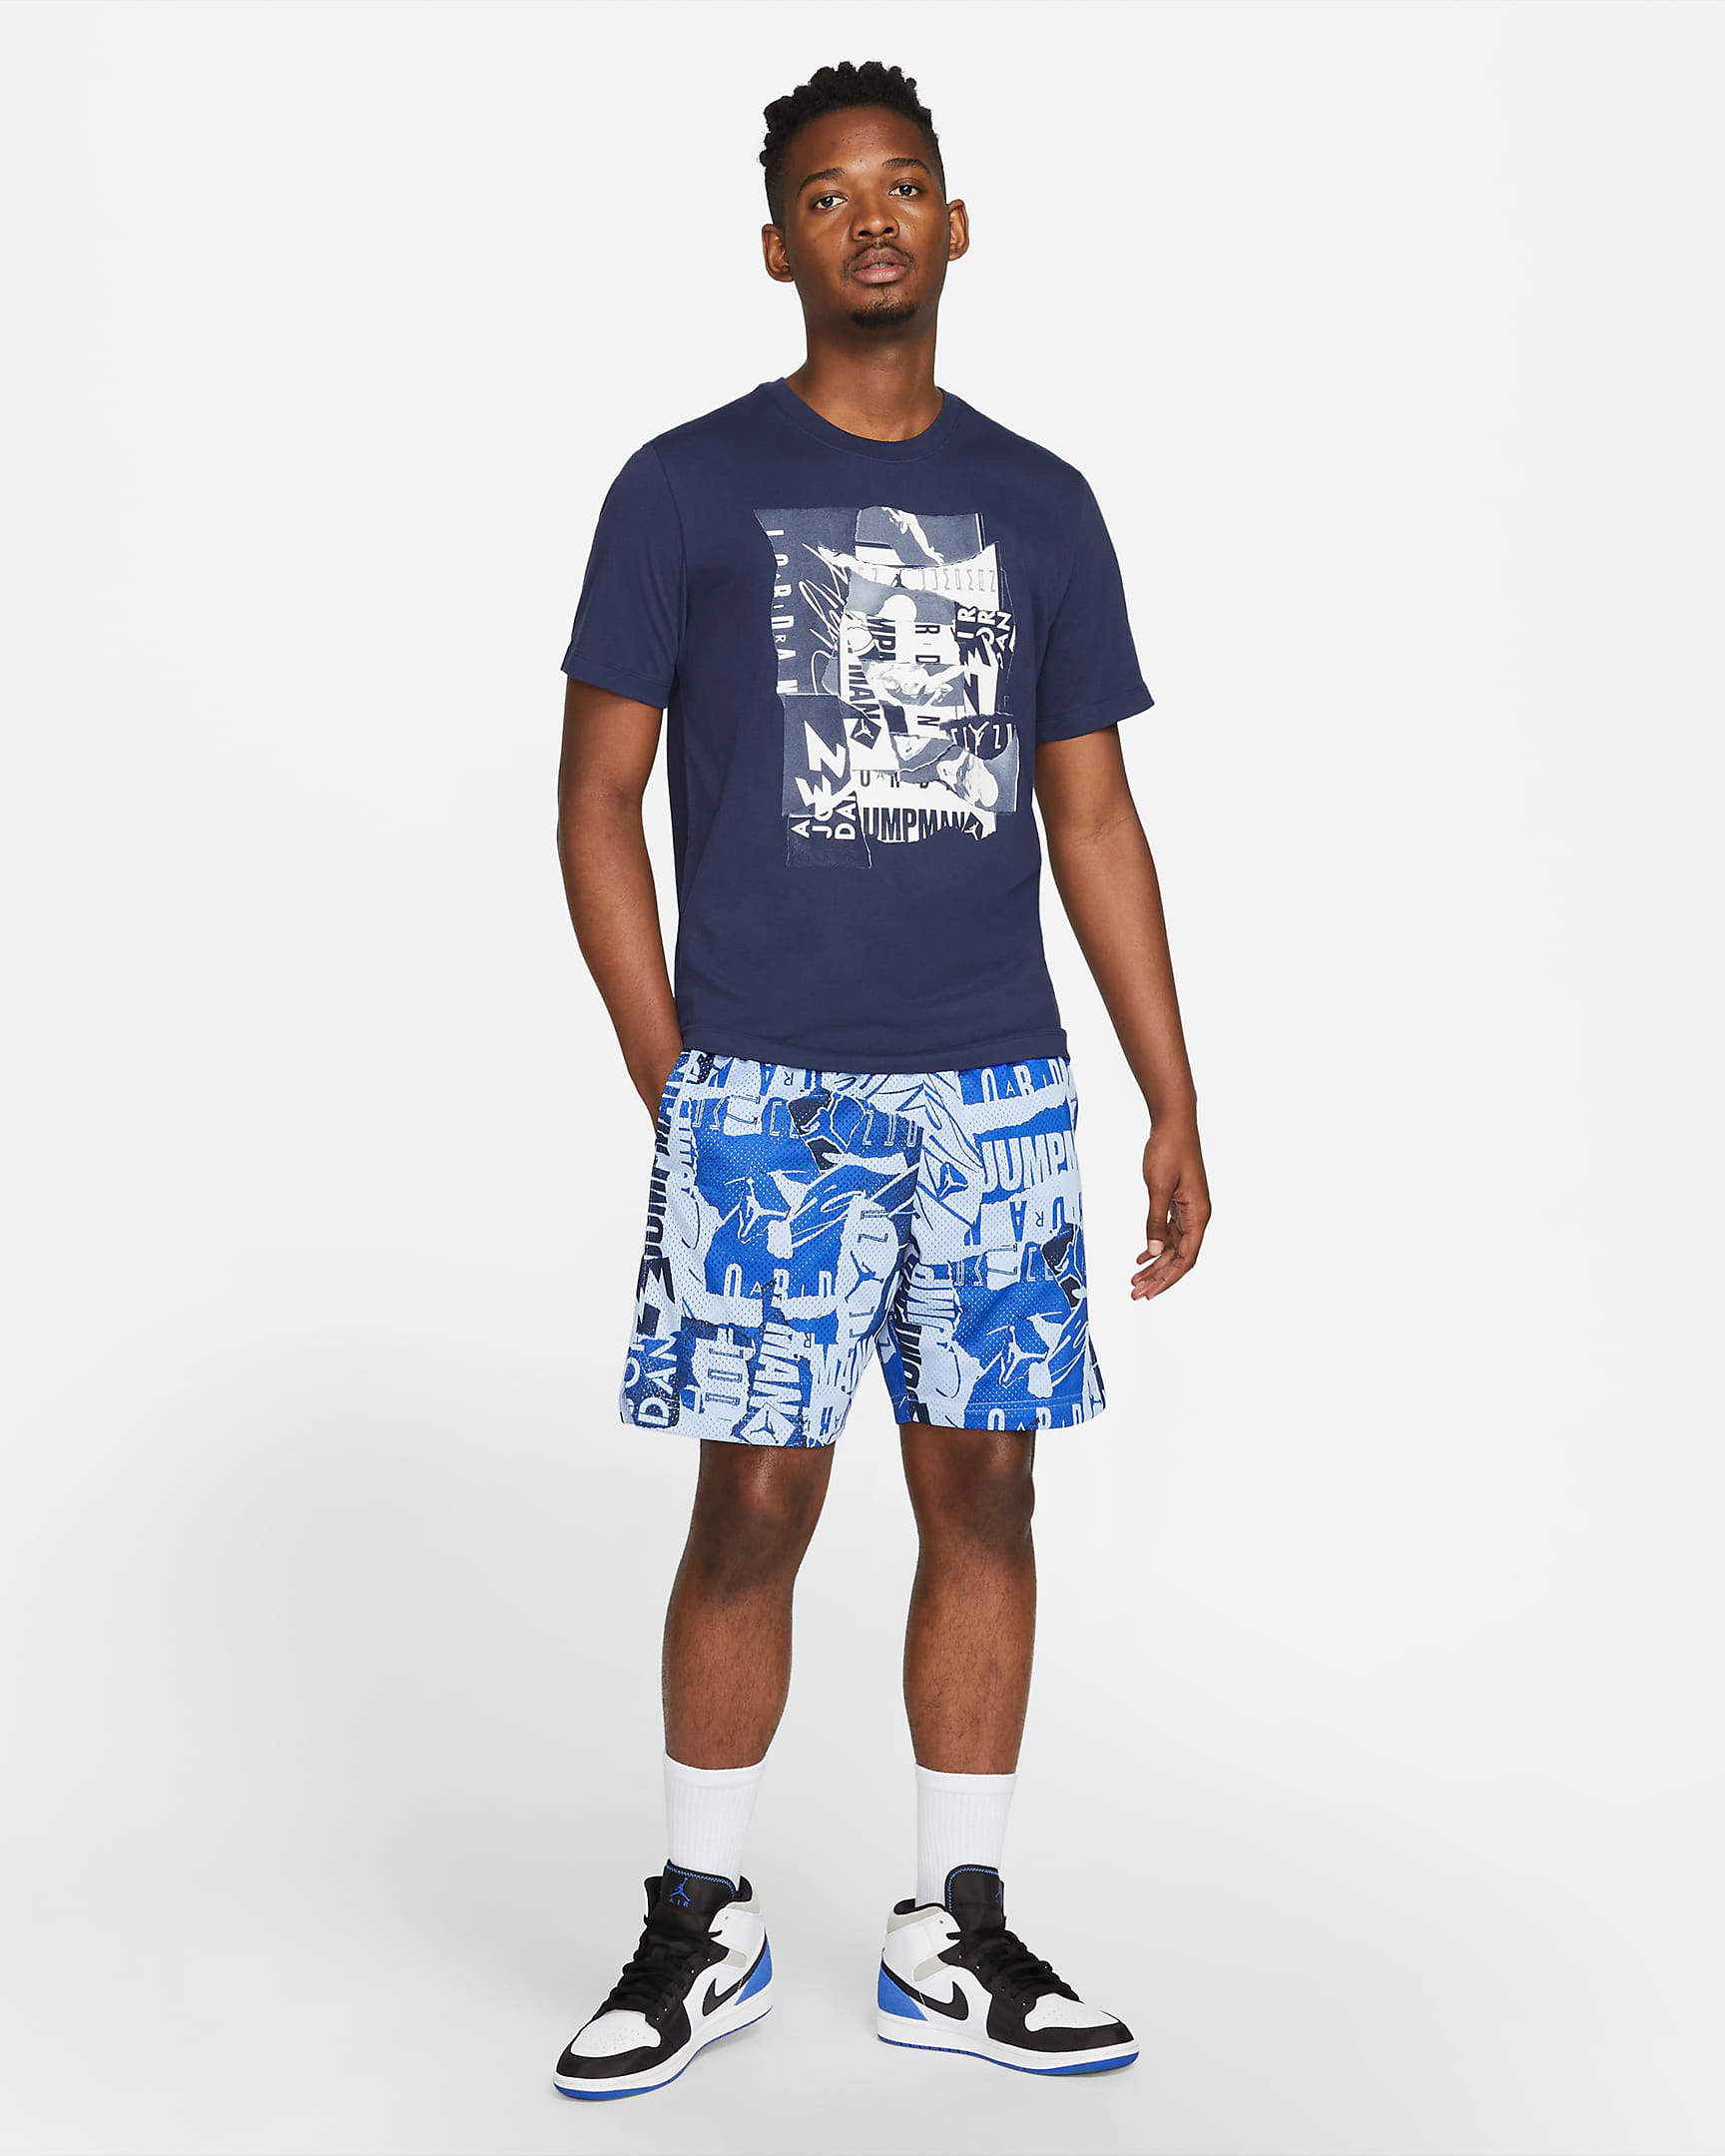 jordan-midnight-navy-shirt-shorts-outfit